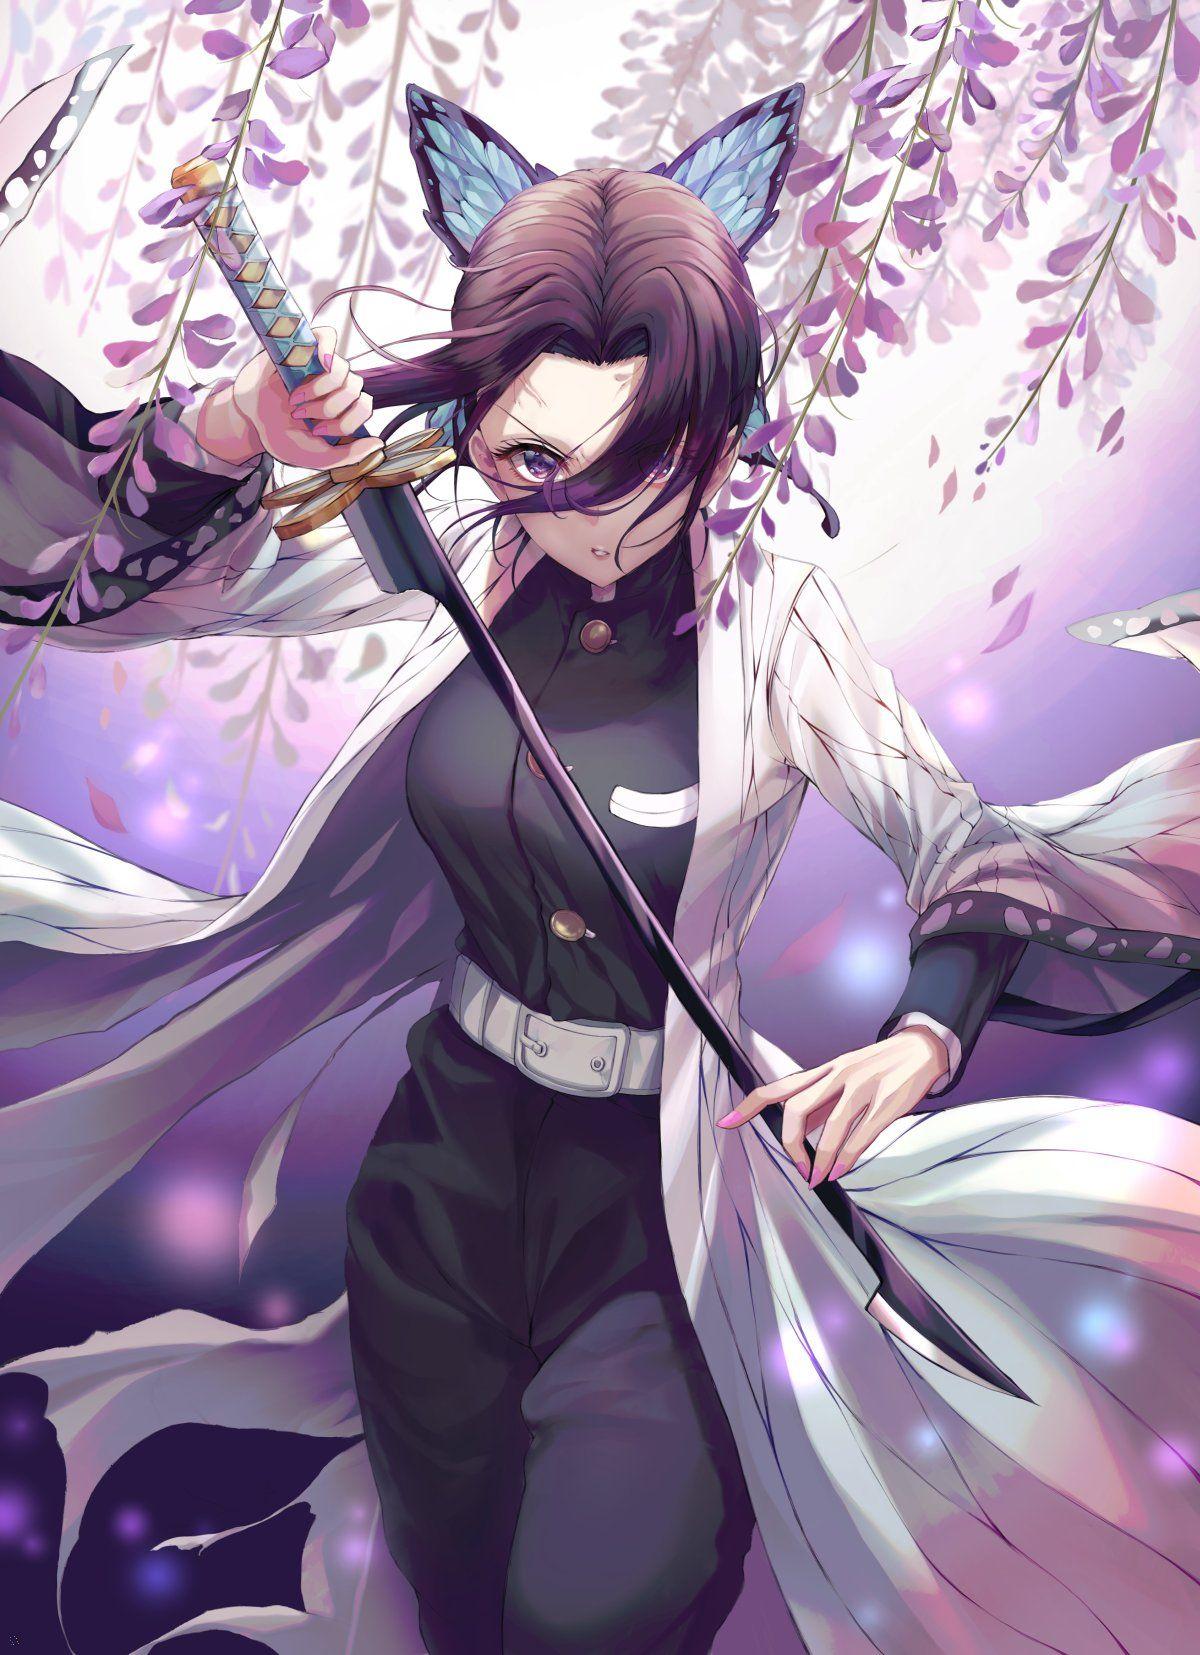 Shinobu Demon Slayer By Csc00014 Anime Wallpaper Download Anime Wallpaper Android Wallpaper Anime Demon anime wallpaper for android